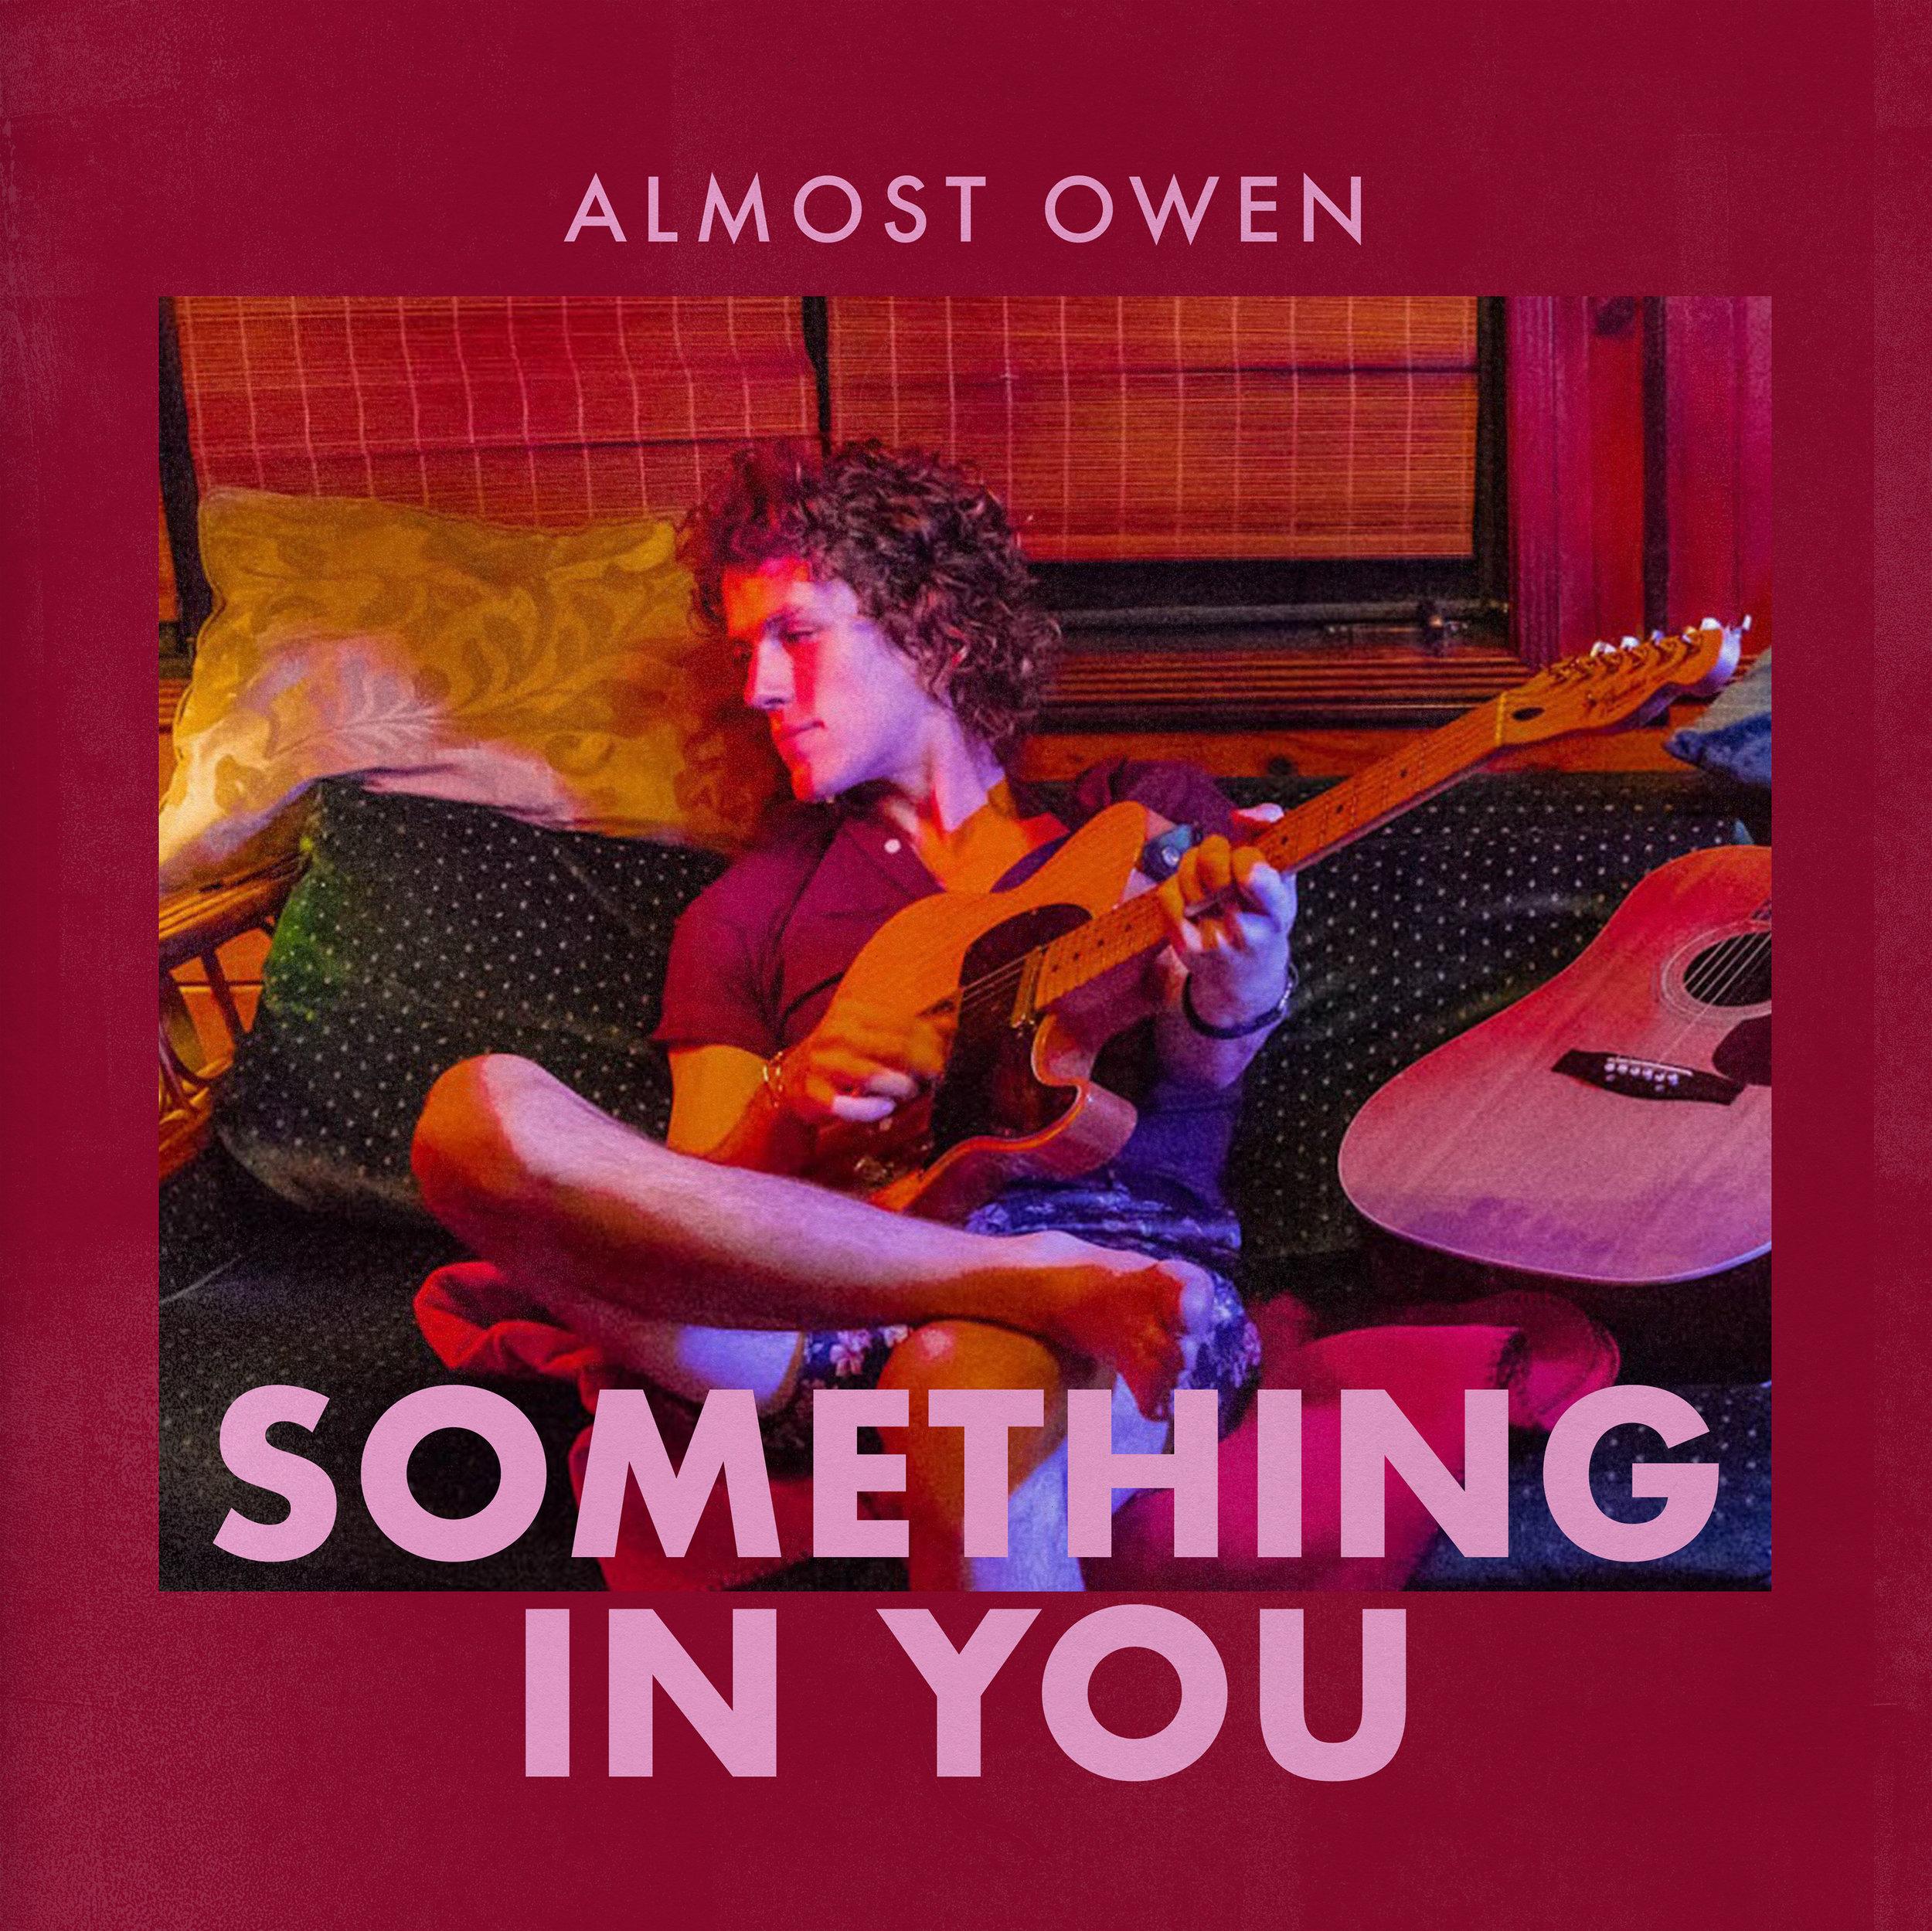 Almost Owen: Something in You artwork